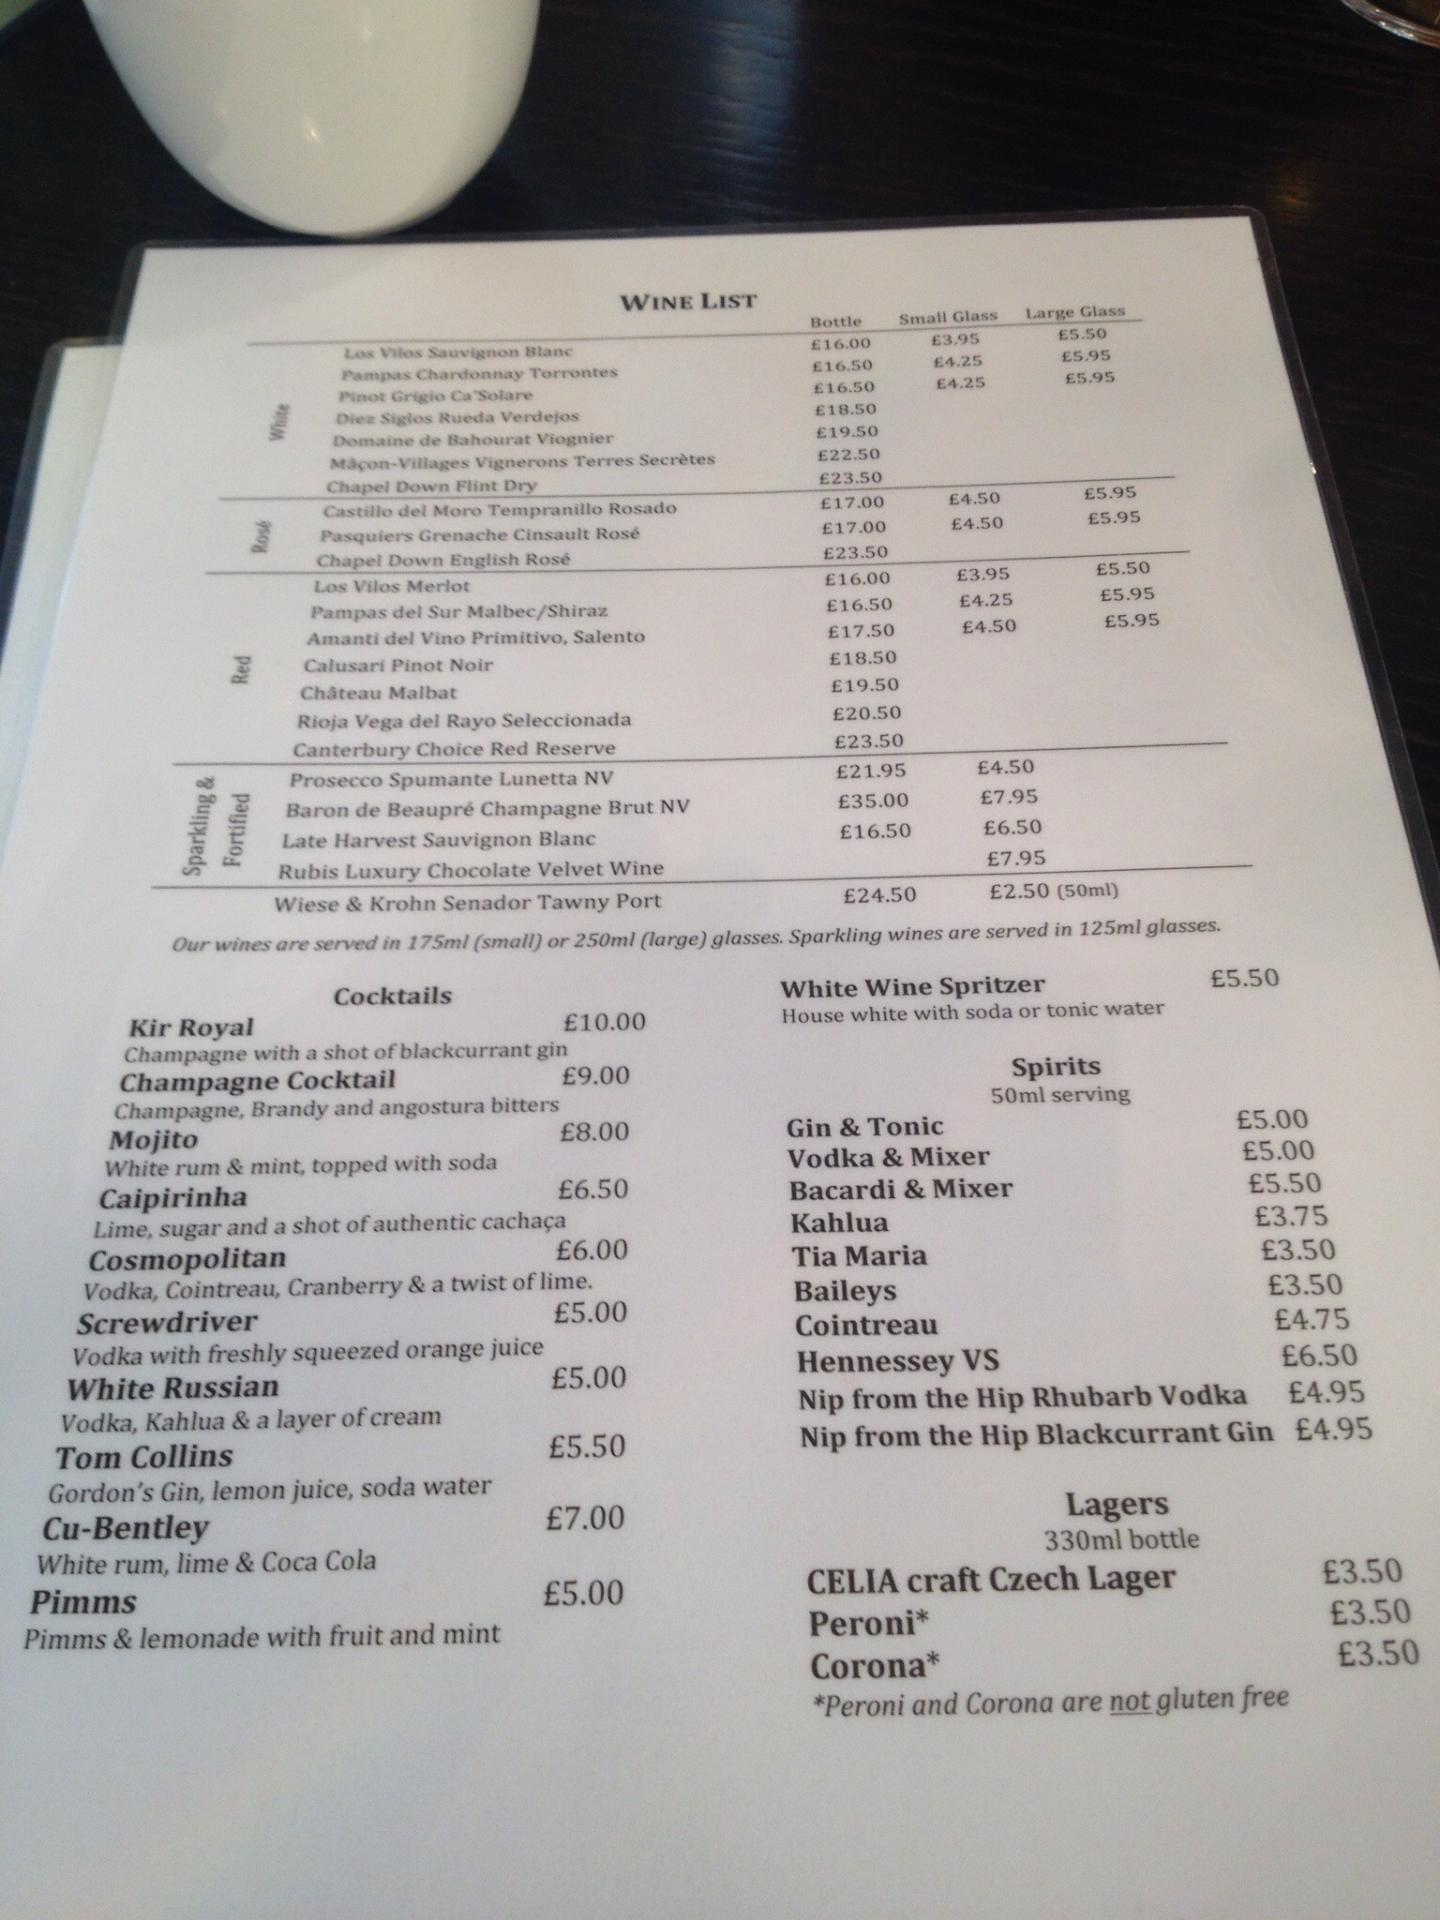 adventures of a gluten free globetrekker Restaurant Review: Oscar & Bentley's, 100% Gluten Free Canterbury, Kent Gluten Free Travel UK Kent  gluten free UK 100% gluten free restaurantss